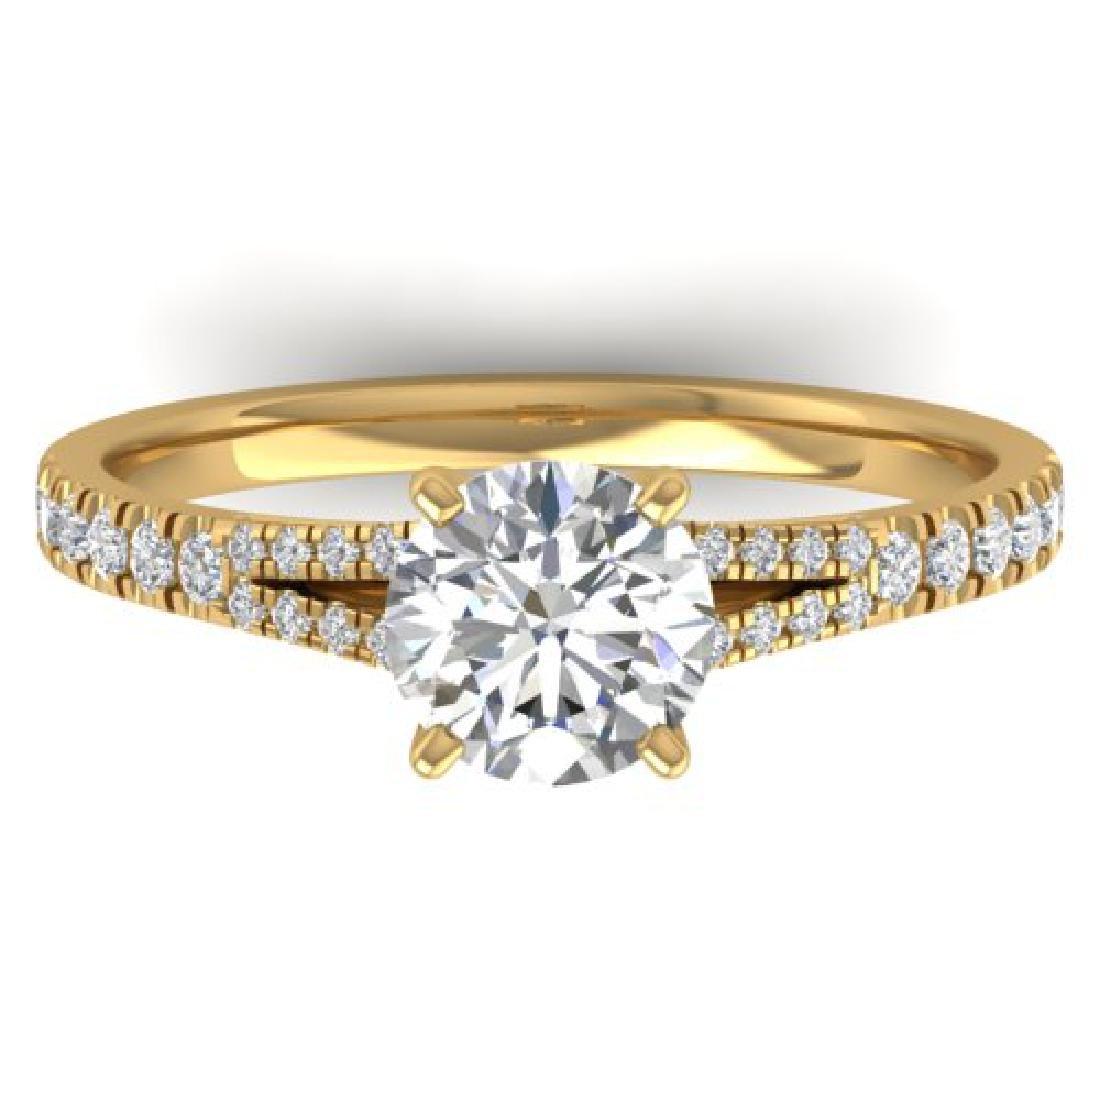 1.36 CTW Certified VS/SI Diamond Solitaire Art Deco